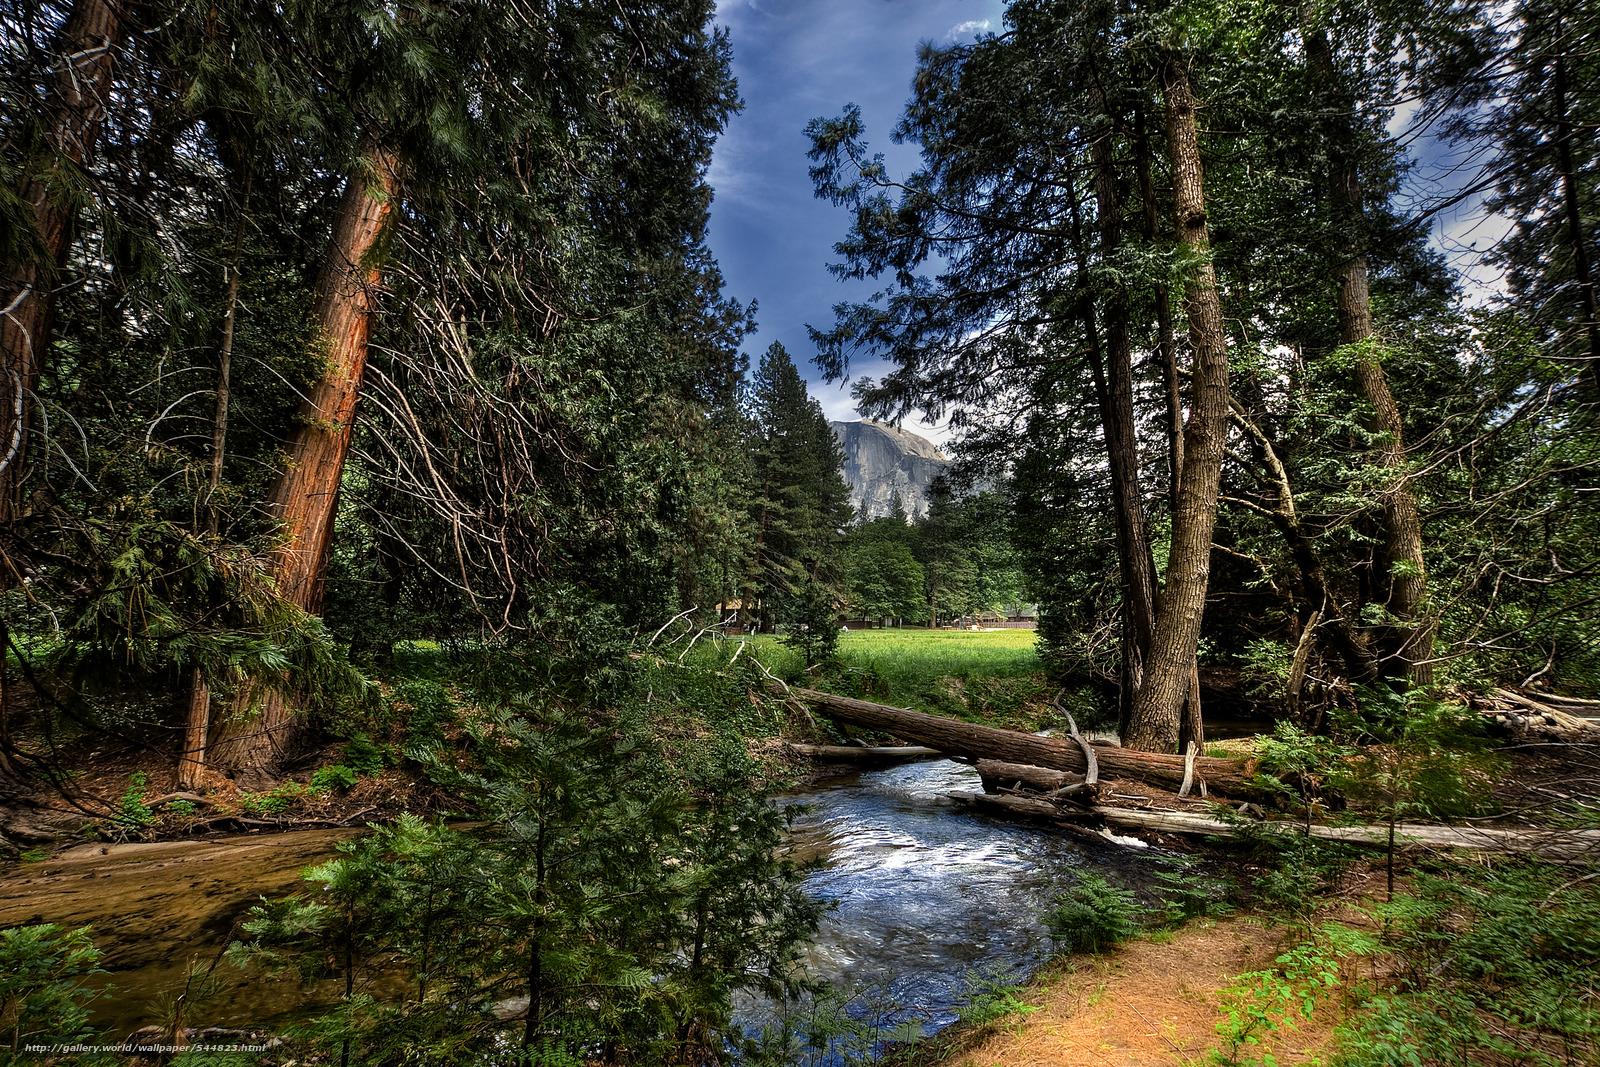 Download wallpaper Yosemite National Park,  forest,  river,  landscape free desktop wallpaper in the resolution 7500x5000 — picture №544823